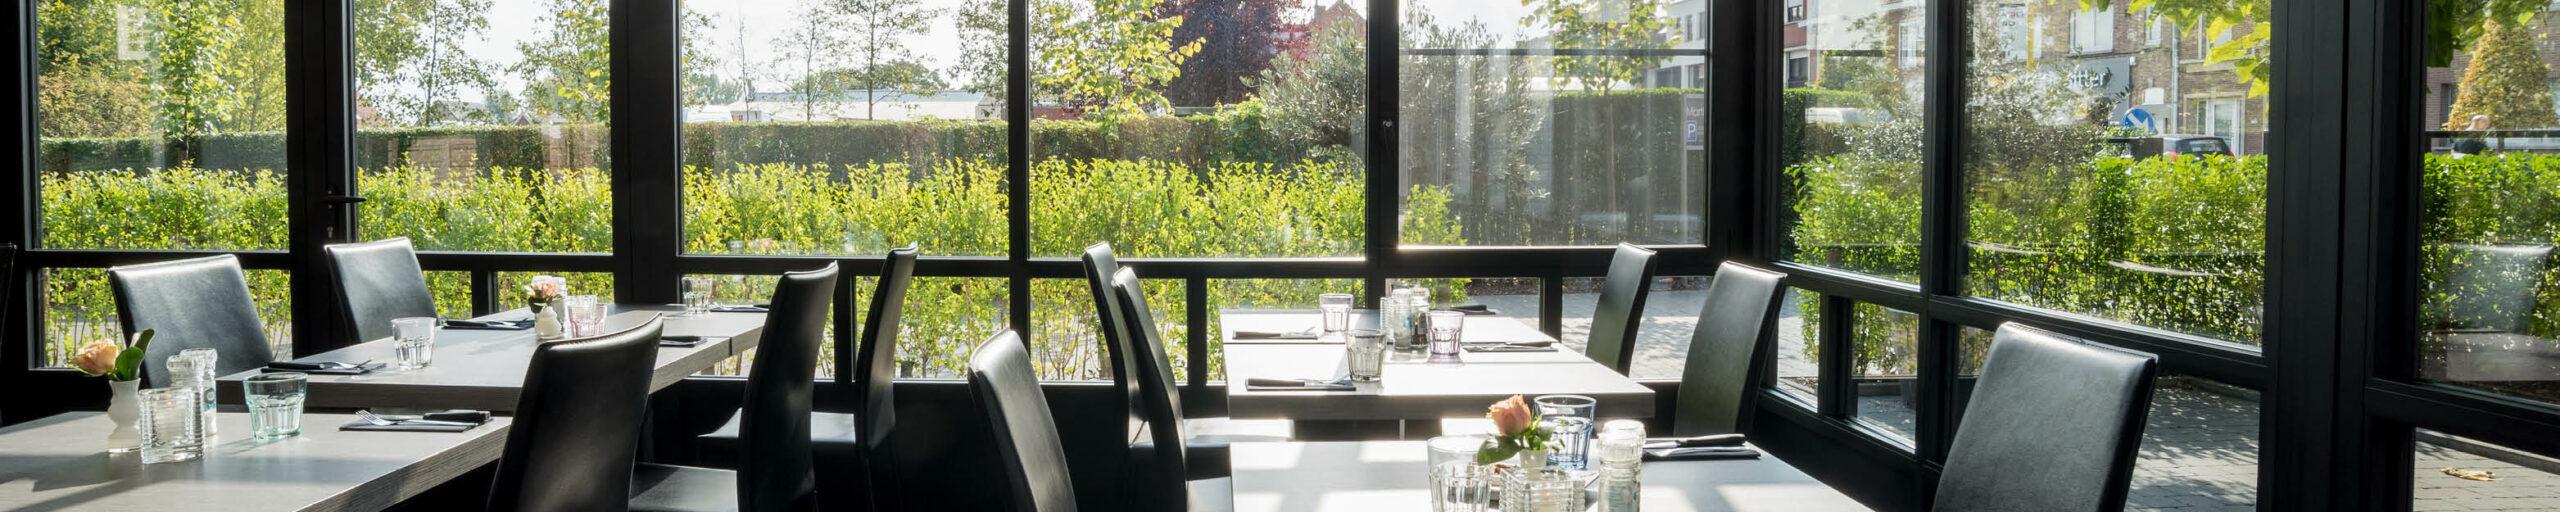 Horeca veranda met tafels in restaurant